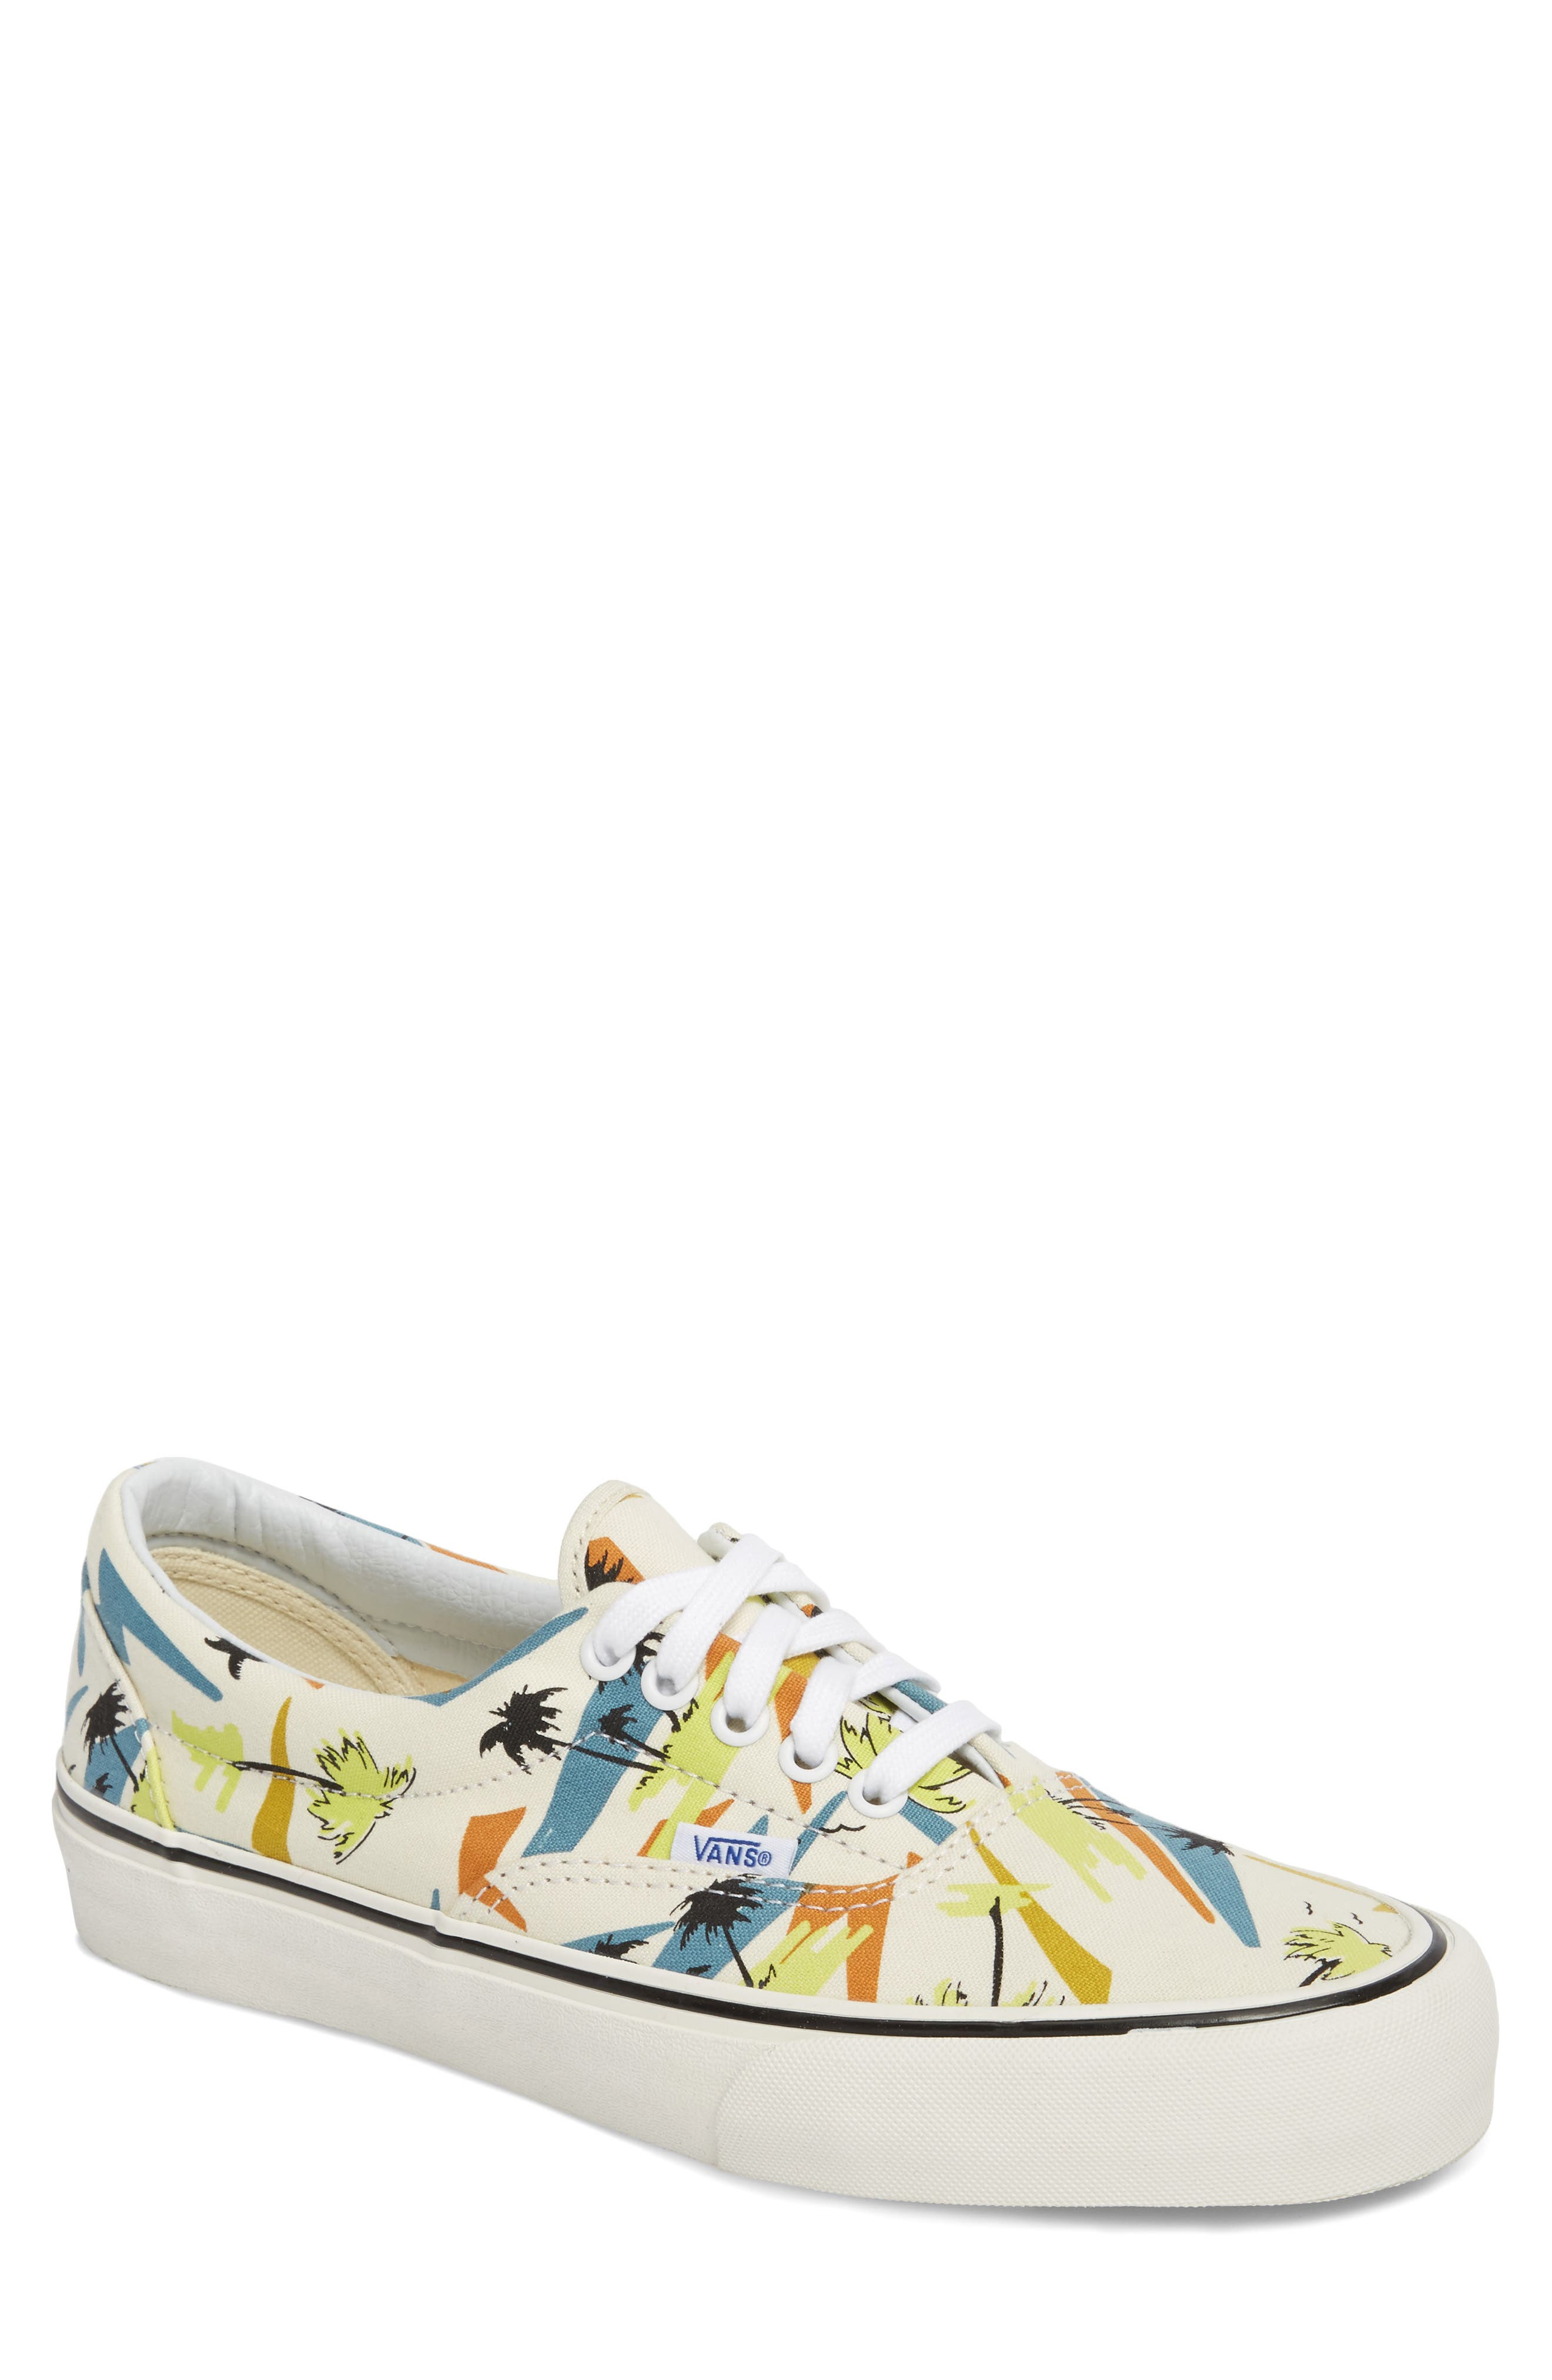 Vans Era SF Low Top Sneaker (Men)